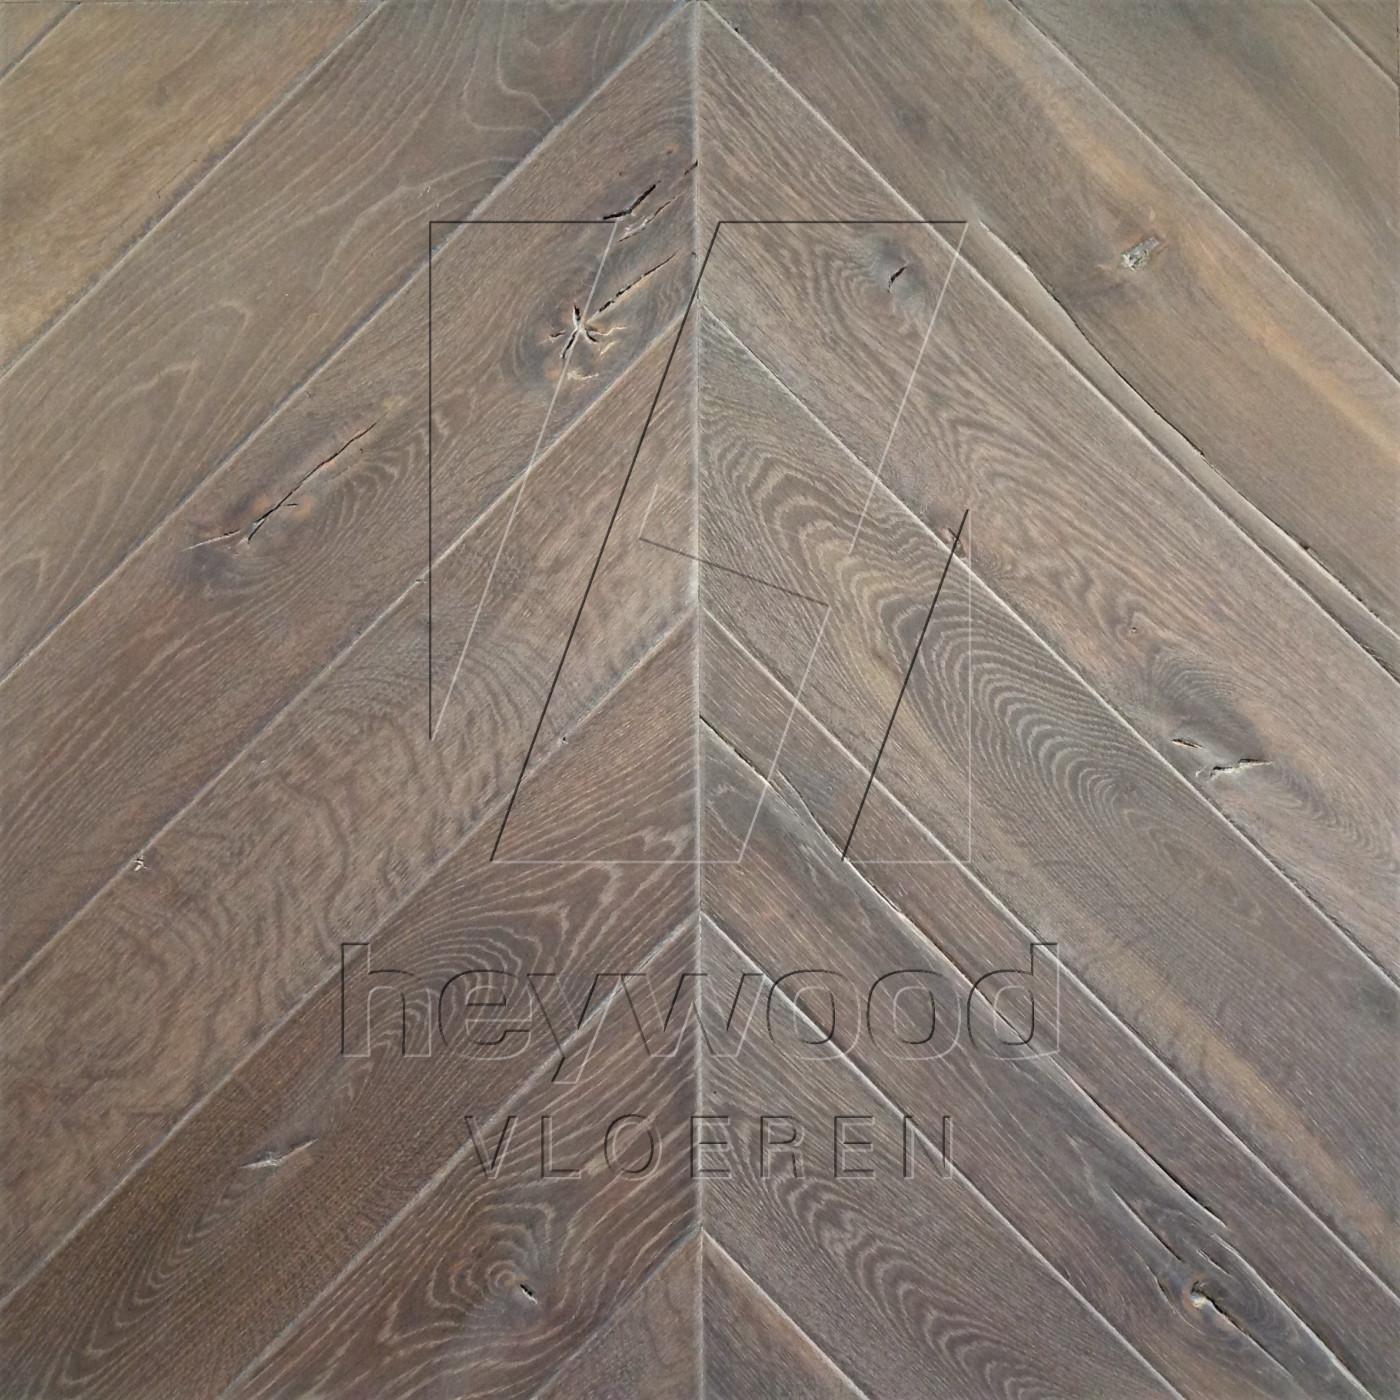 Antique Chevron 'Gran Paradiso' in Chevron of Pattern & Panel Floors